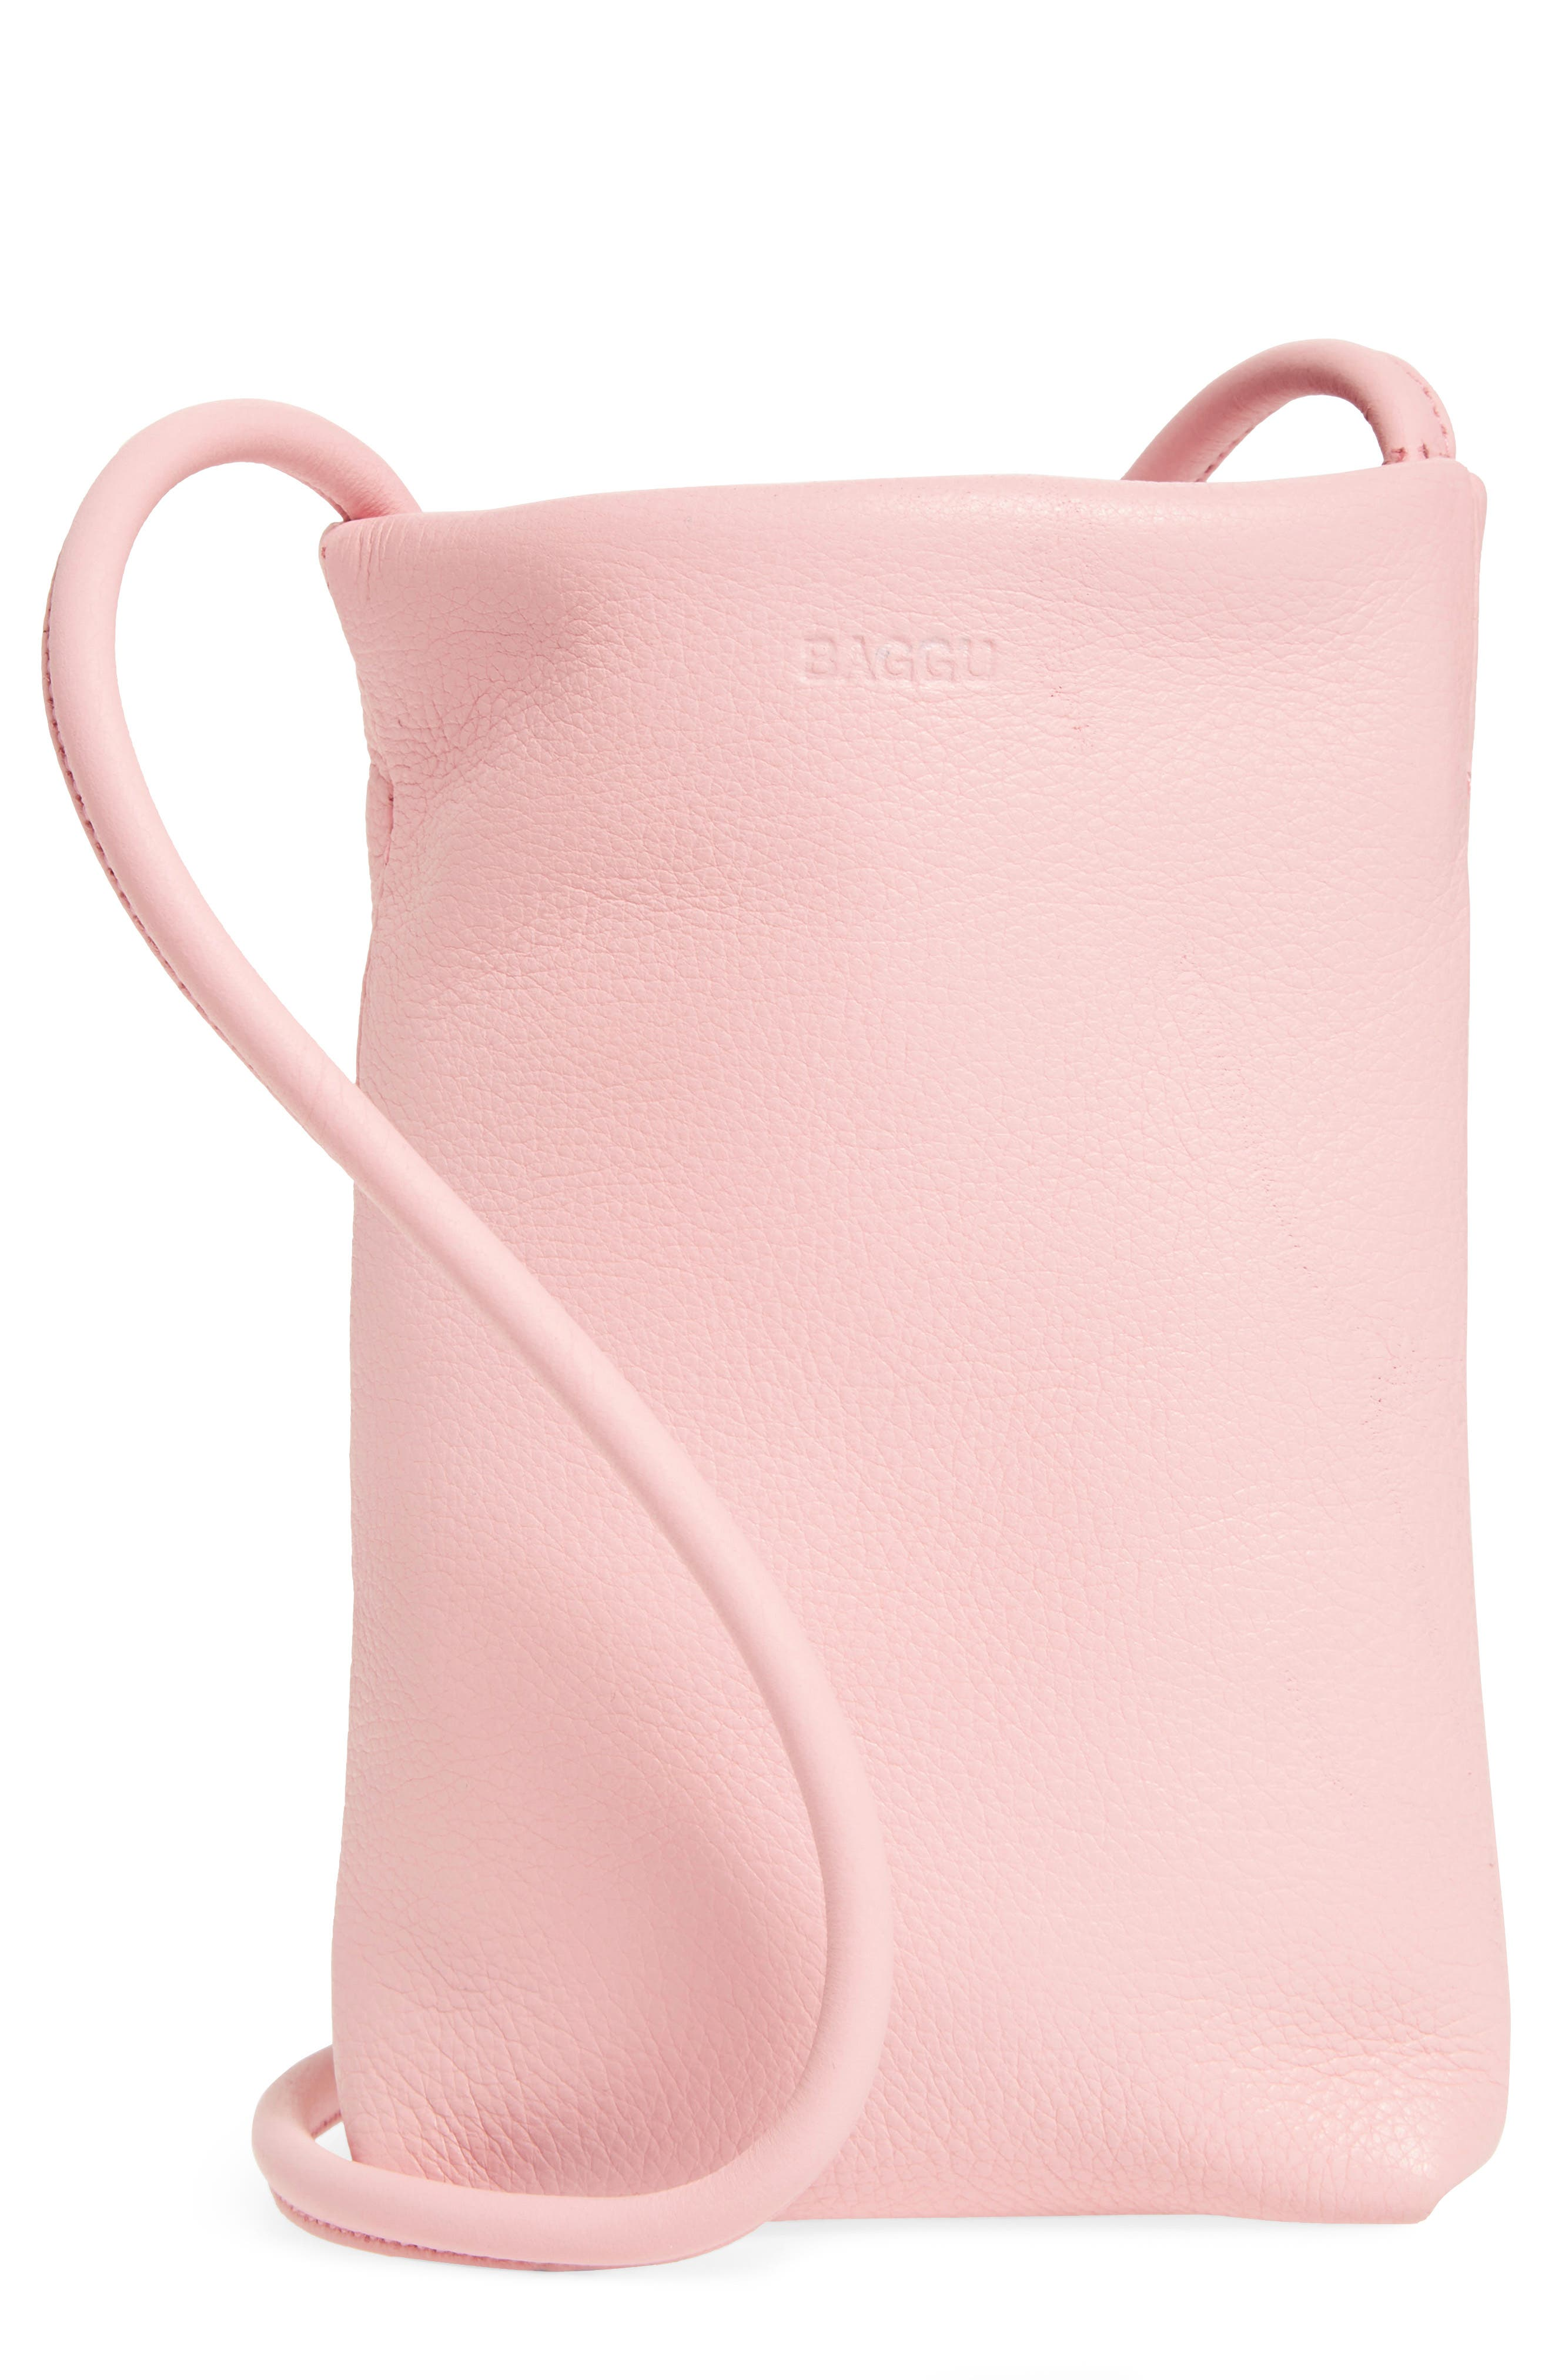 Leather Phone Crossbody Bag,                             Main thumbnail 1, color,                             Powder Pink